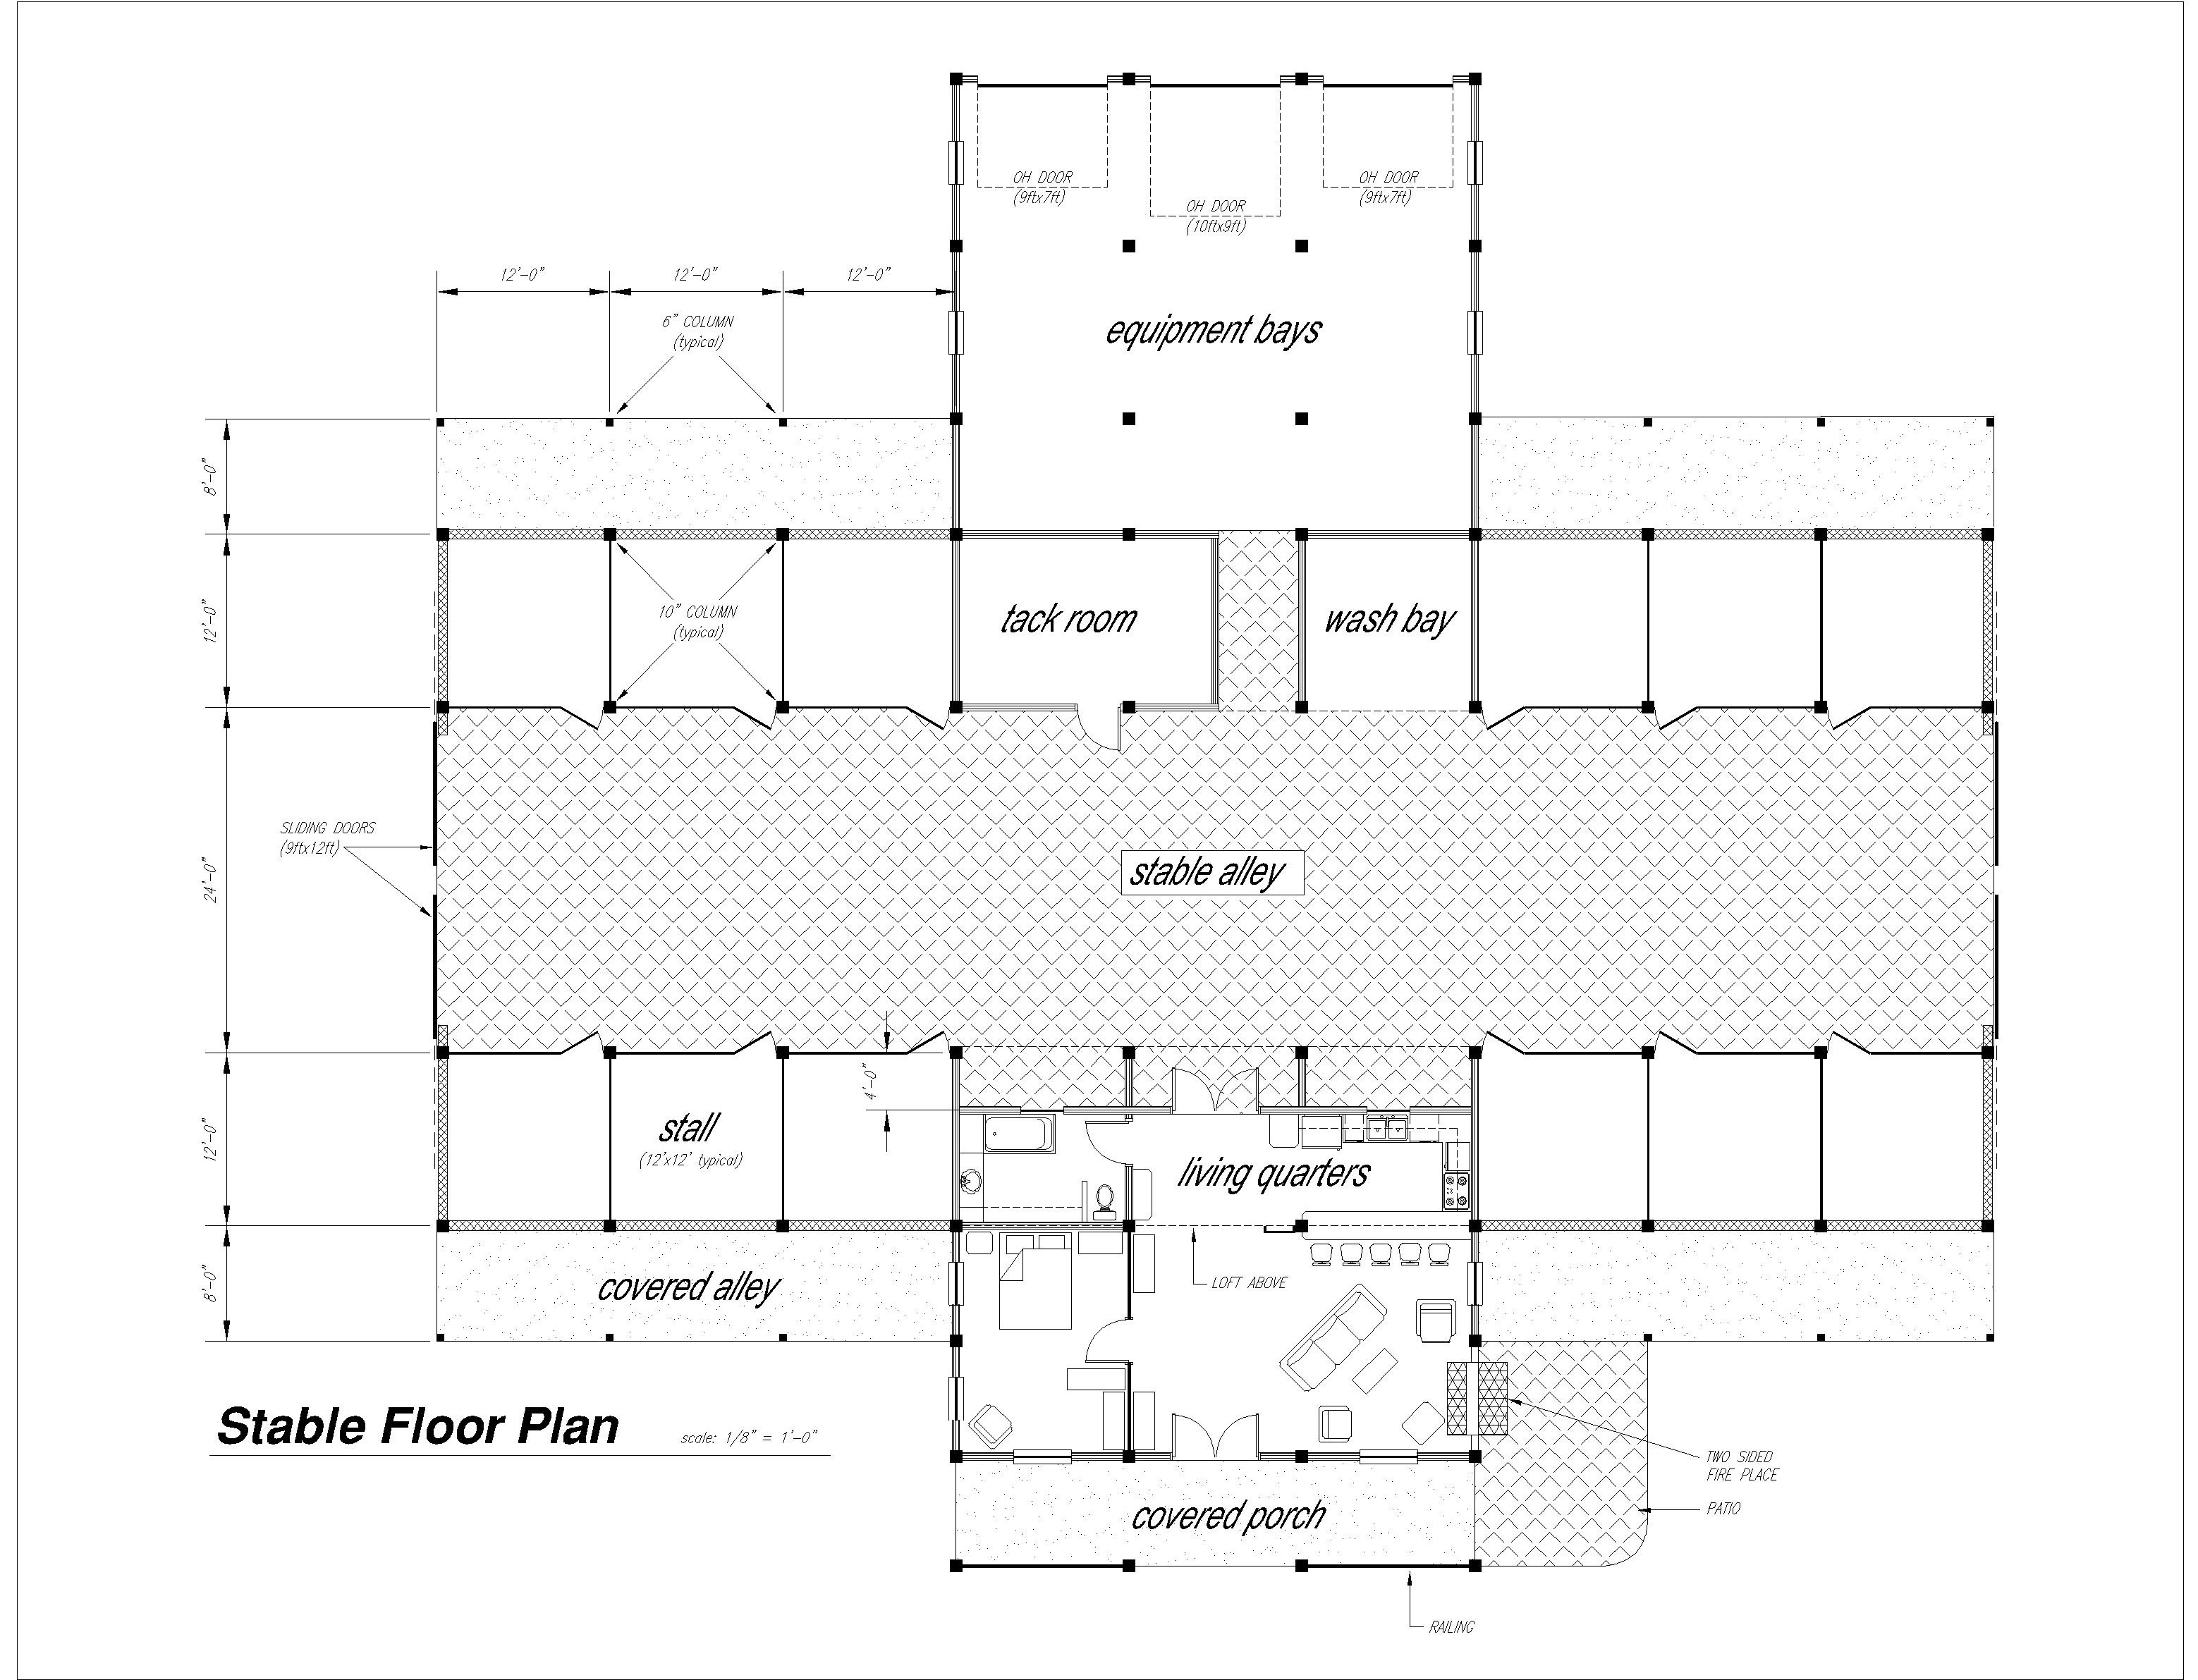 Barn floor plan at riverview stables barn wedding layout for Wedding floor plan designer